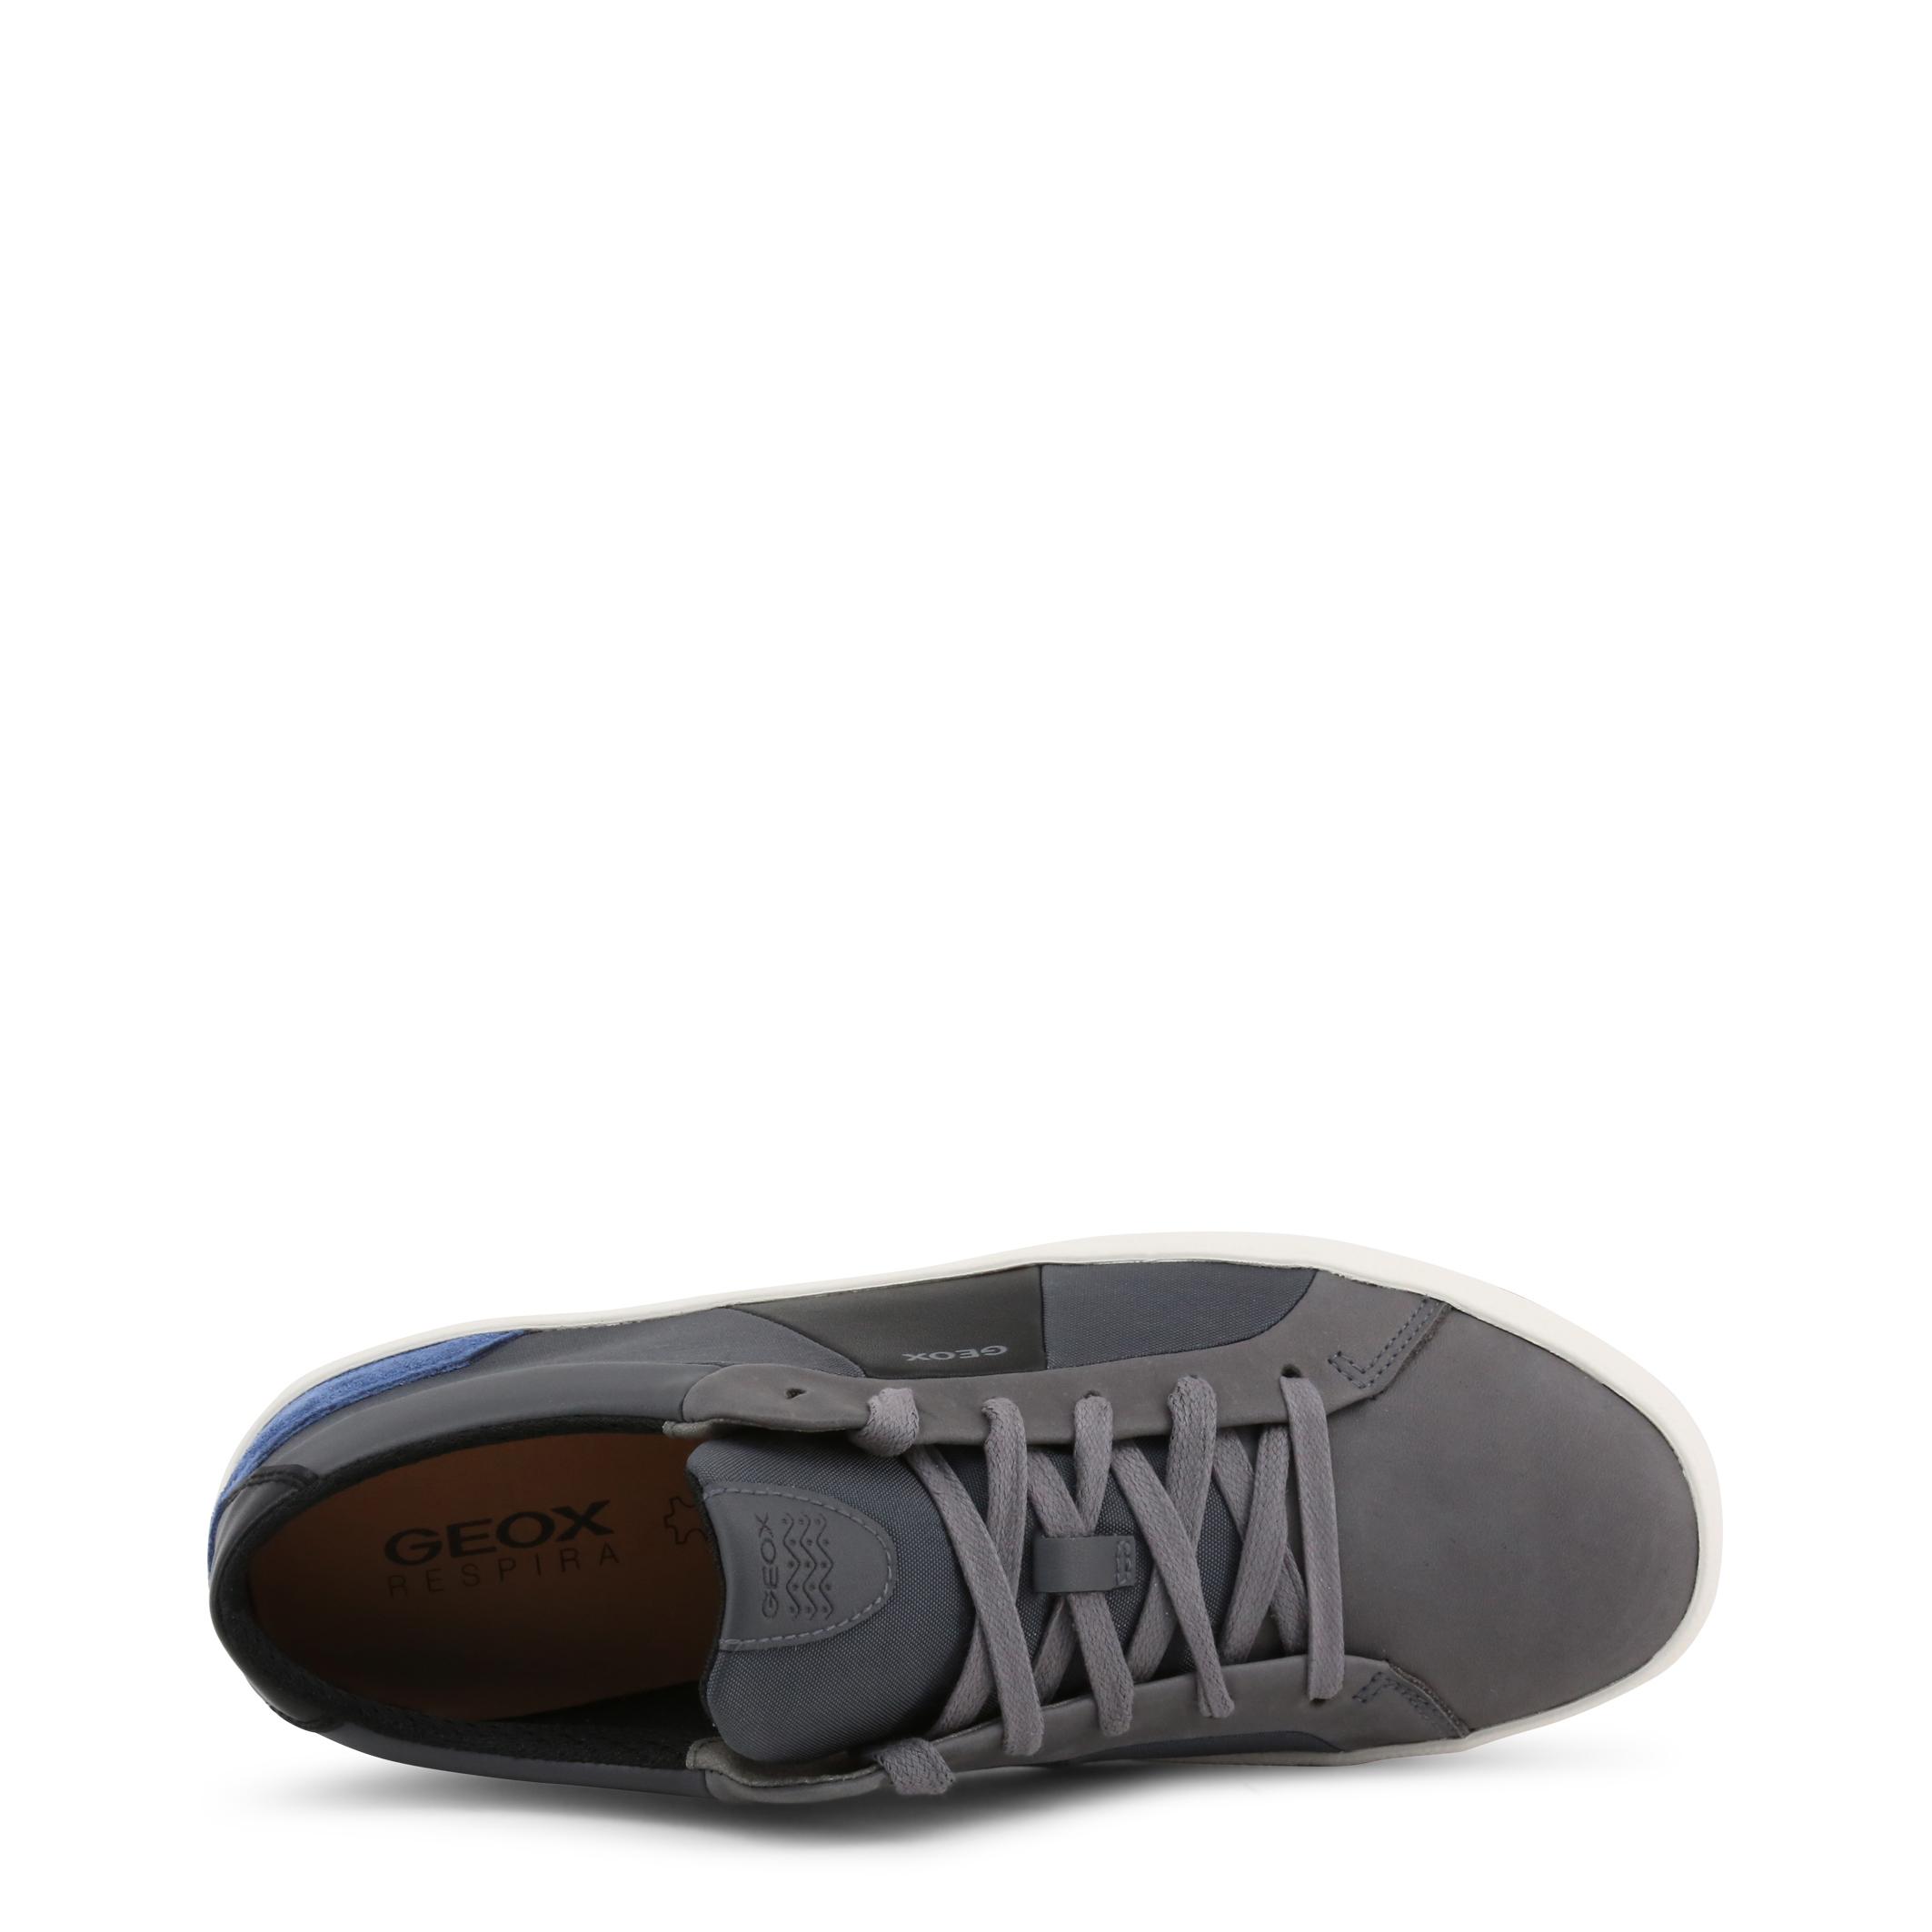 Sneakers-Geox-WARLEY-Uomo-Grigio-100592 miniatura 3